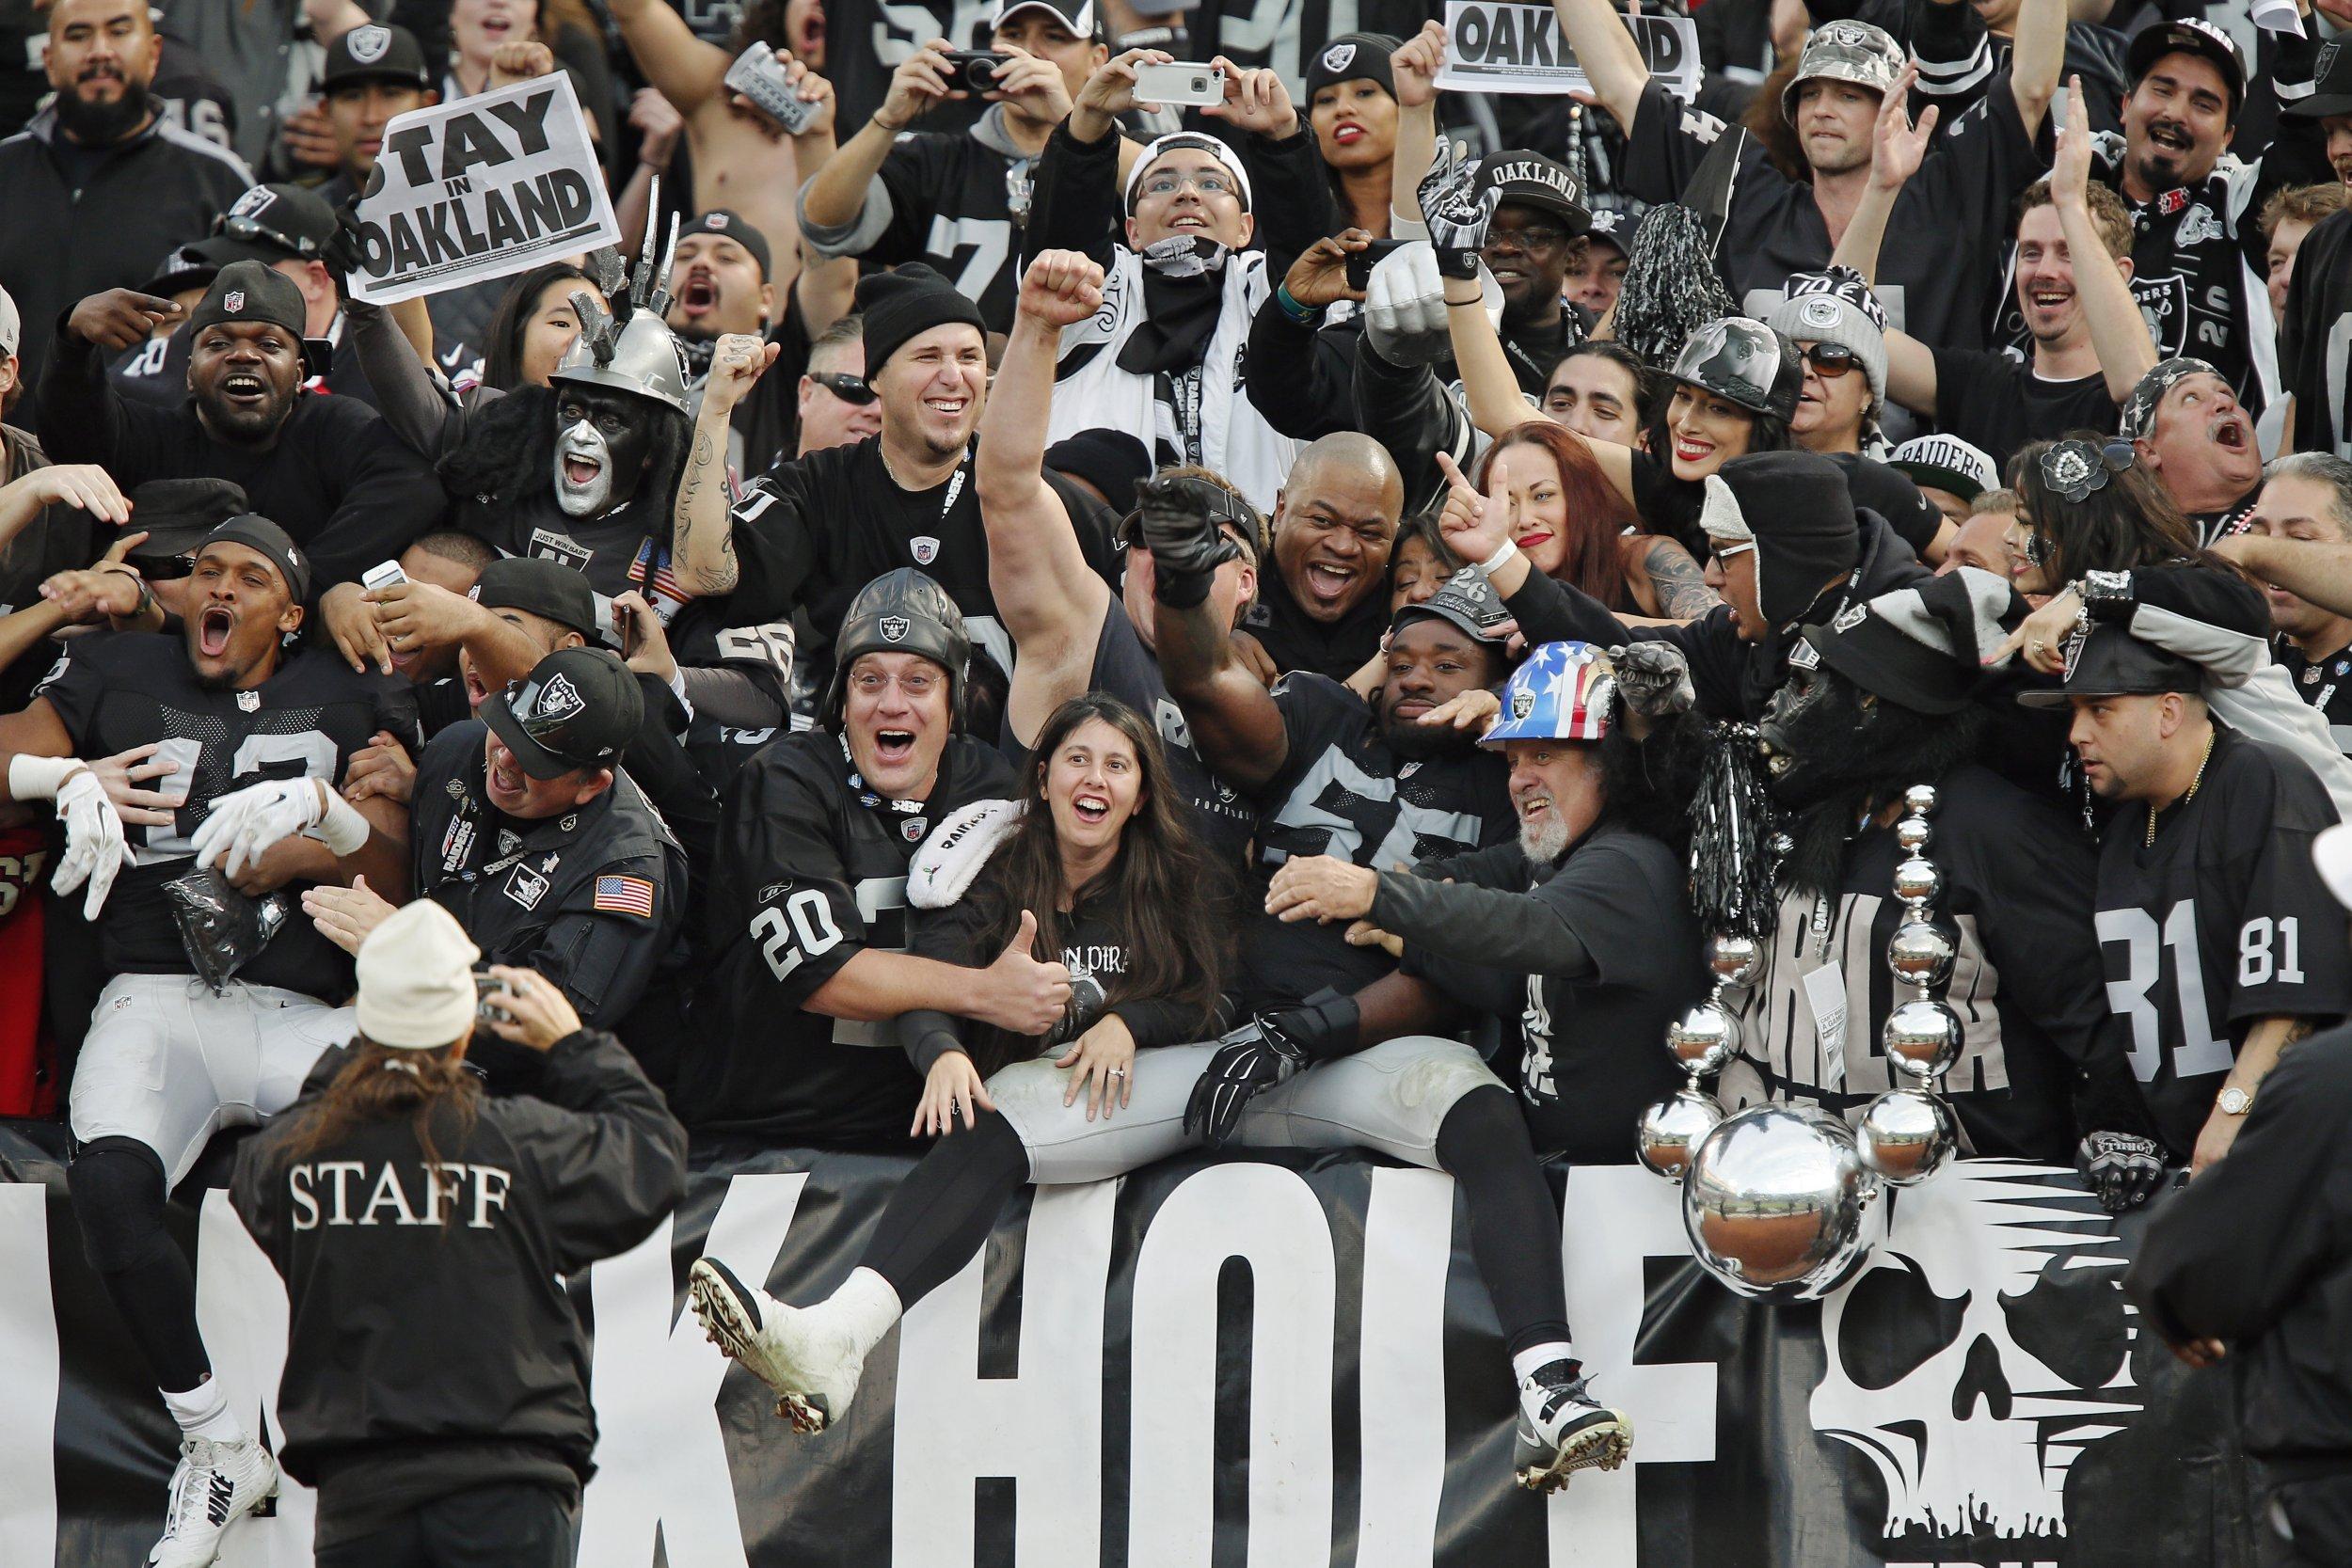 Oakland Raiders Black Hole Fans